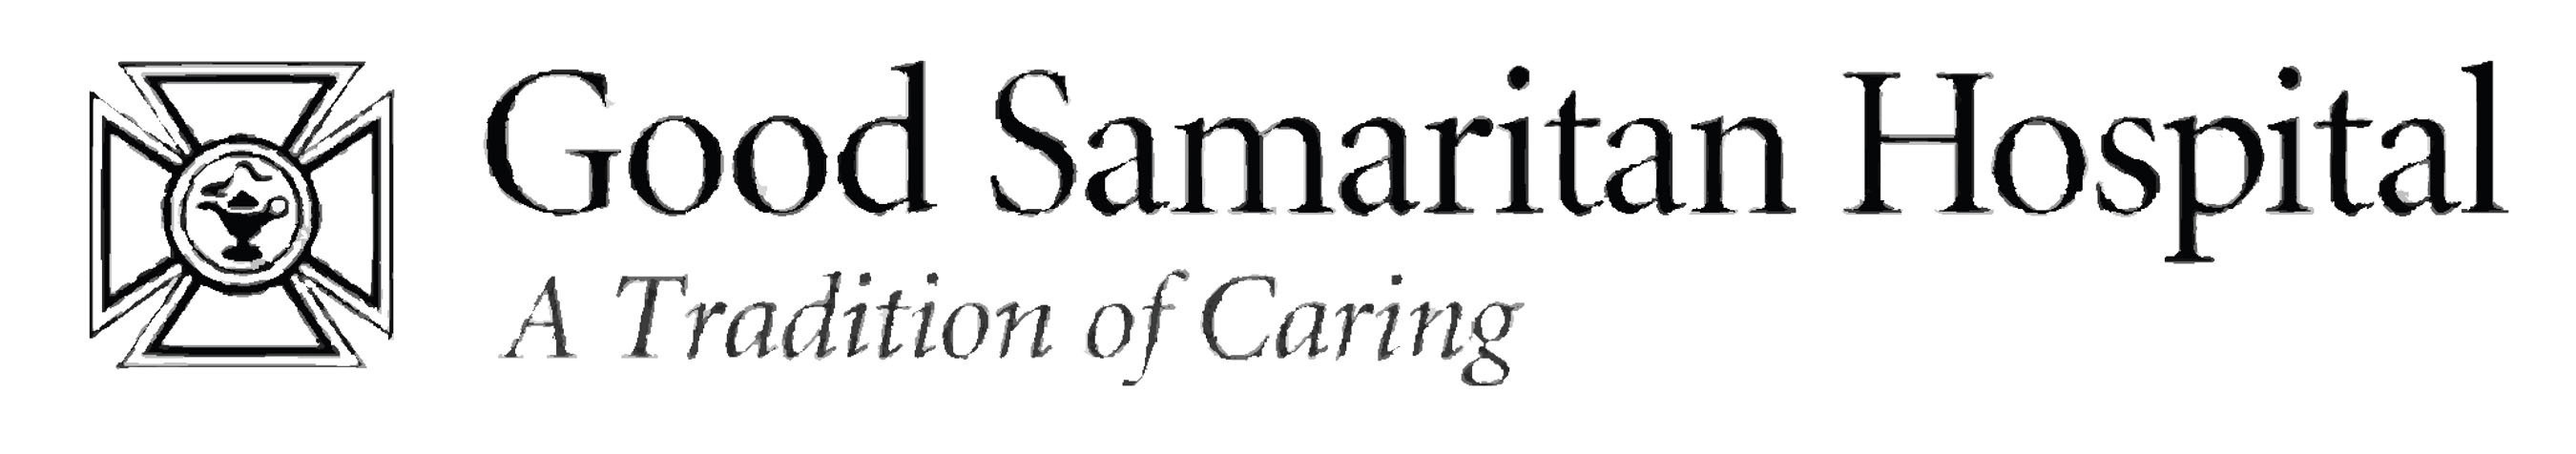 Of agriculture awards telemedicine grant to good samaritan hospital